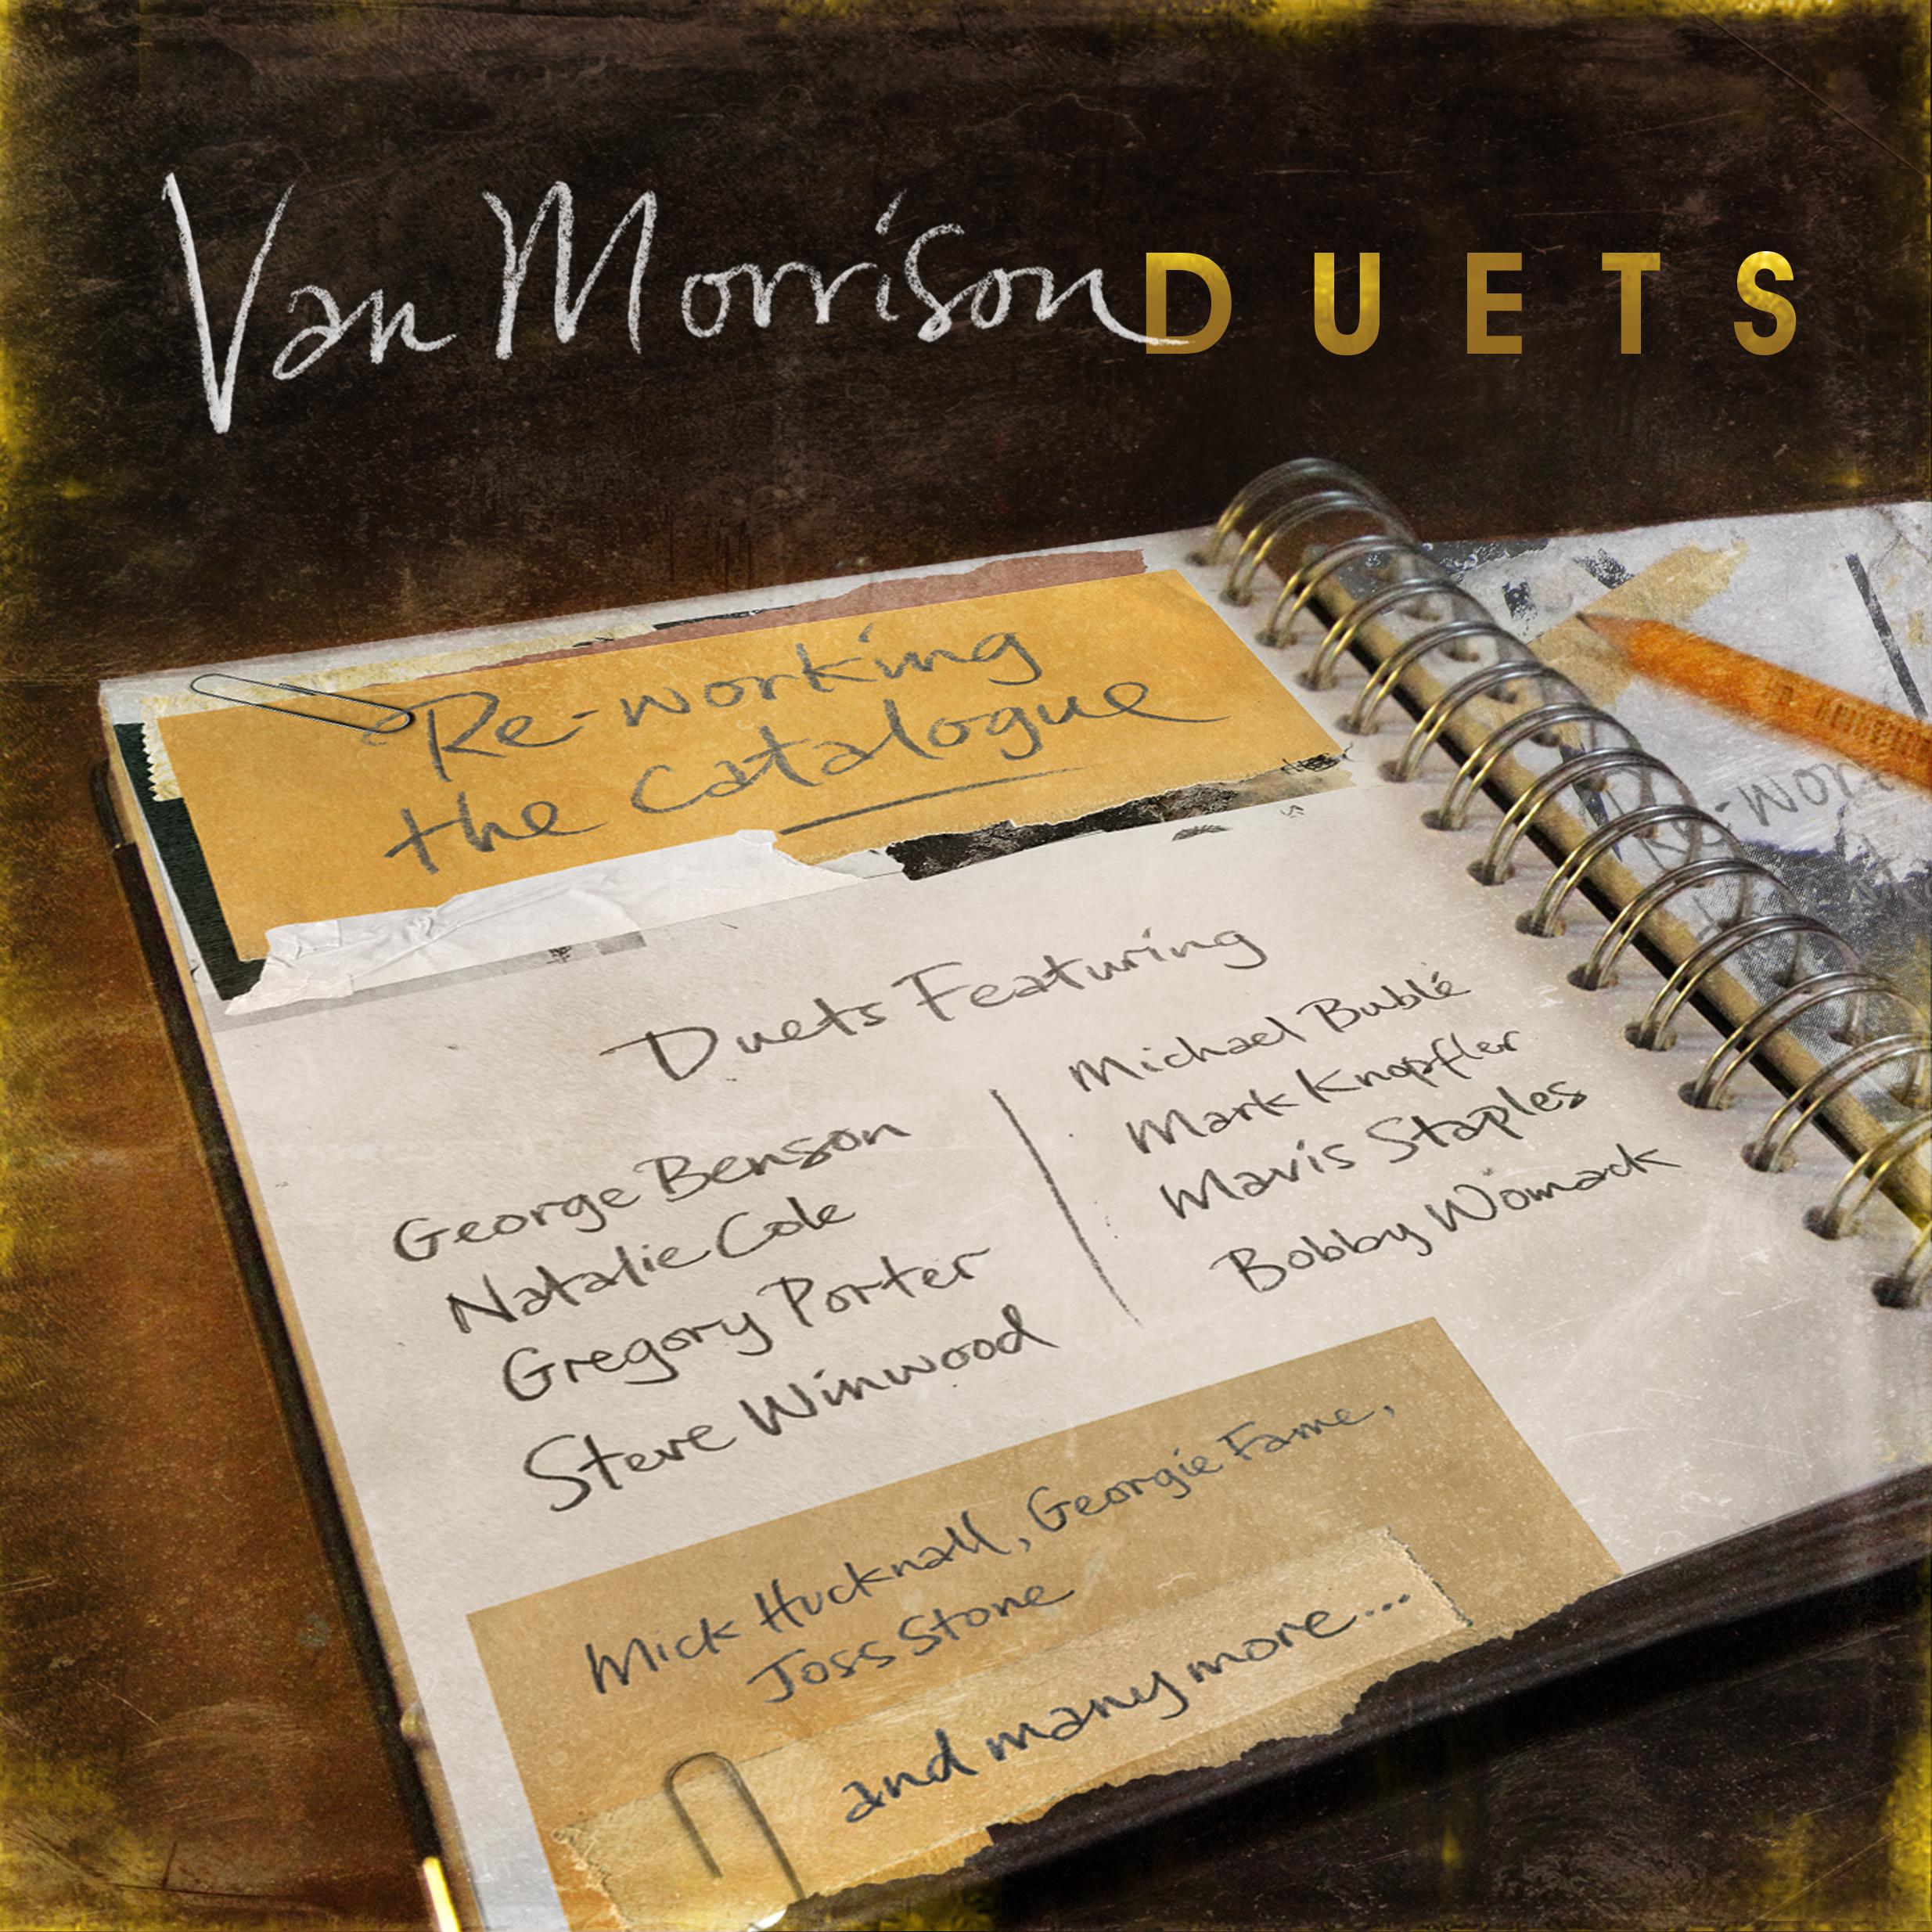 Van Morrison is releasing a brand new album ahead of his UK tour dates